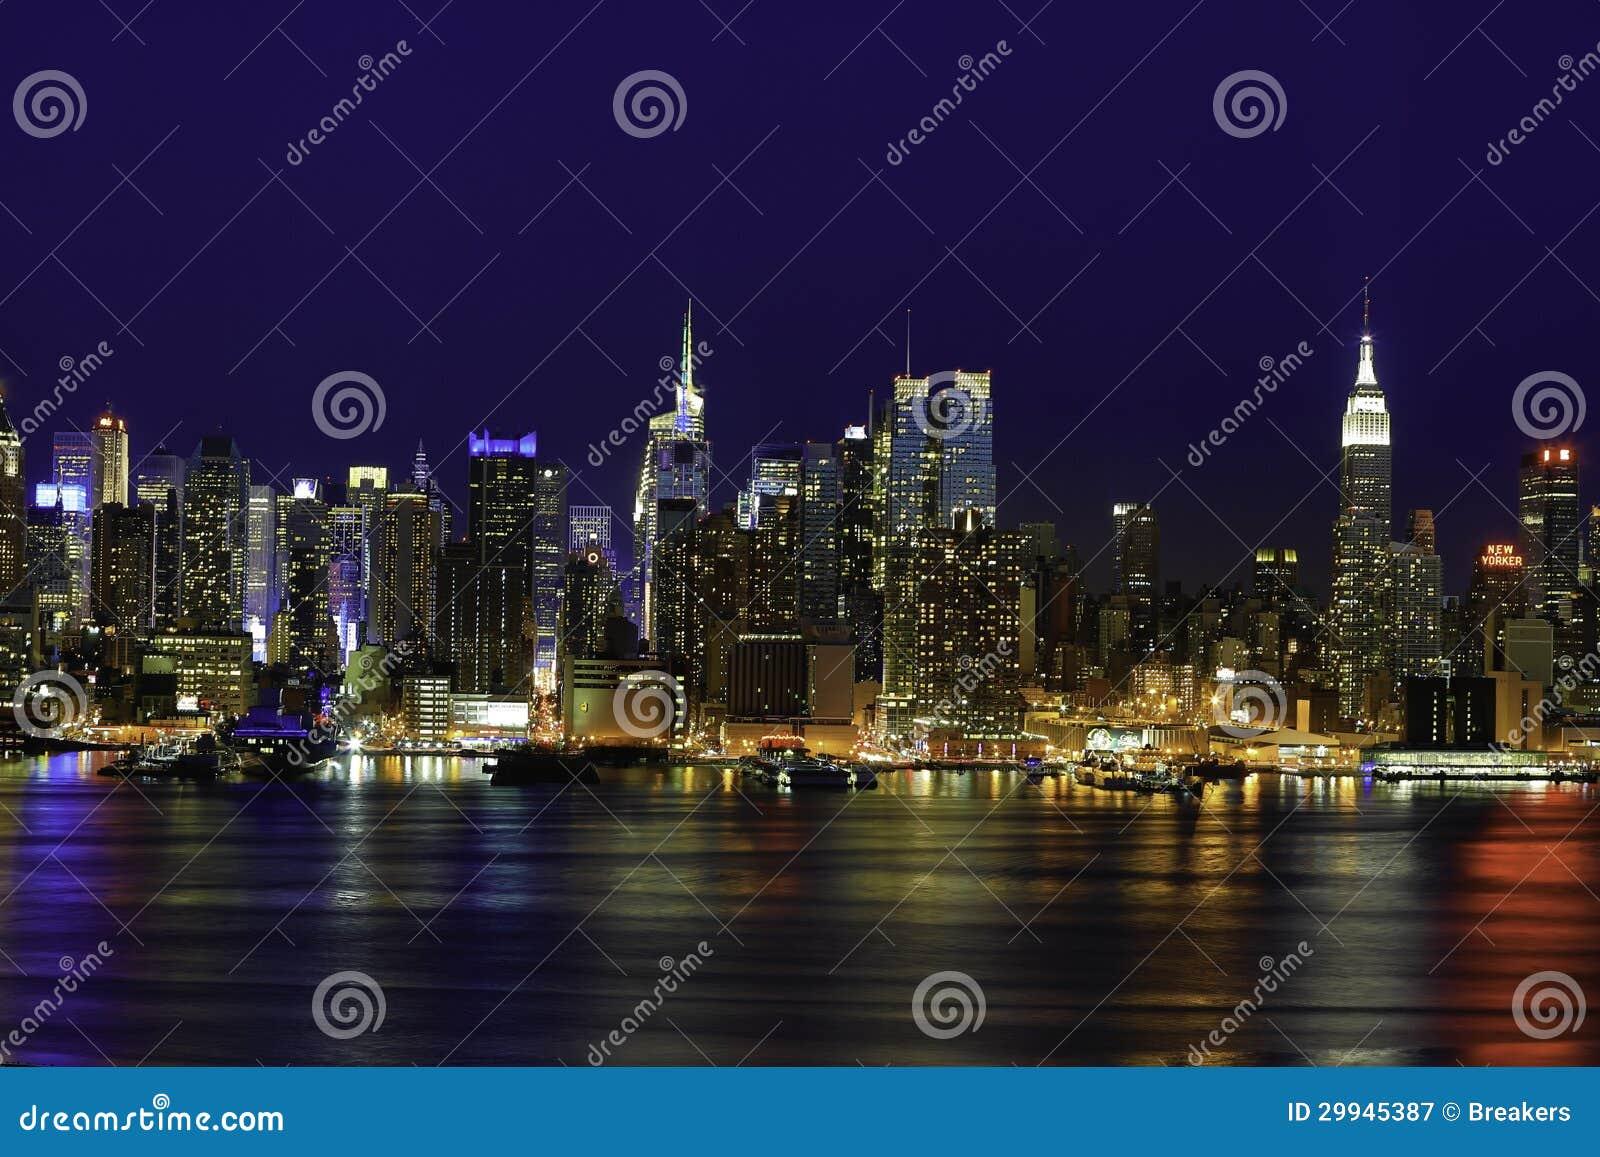 Midtown Manhattan To Jfk Travel Time